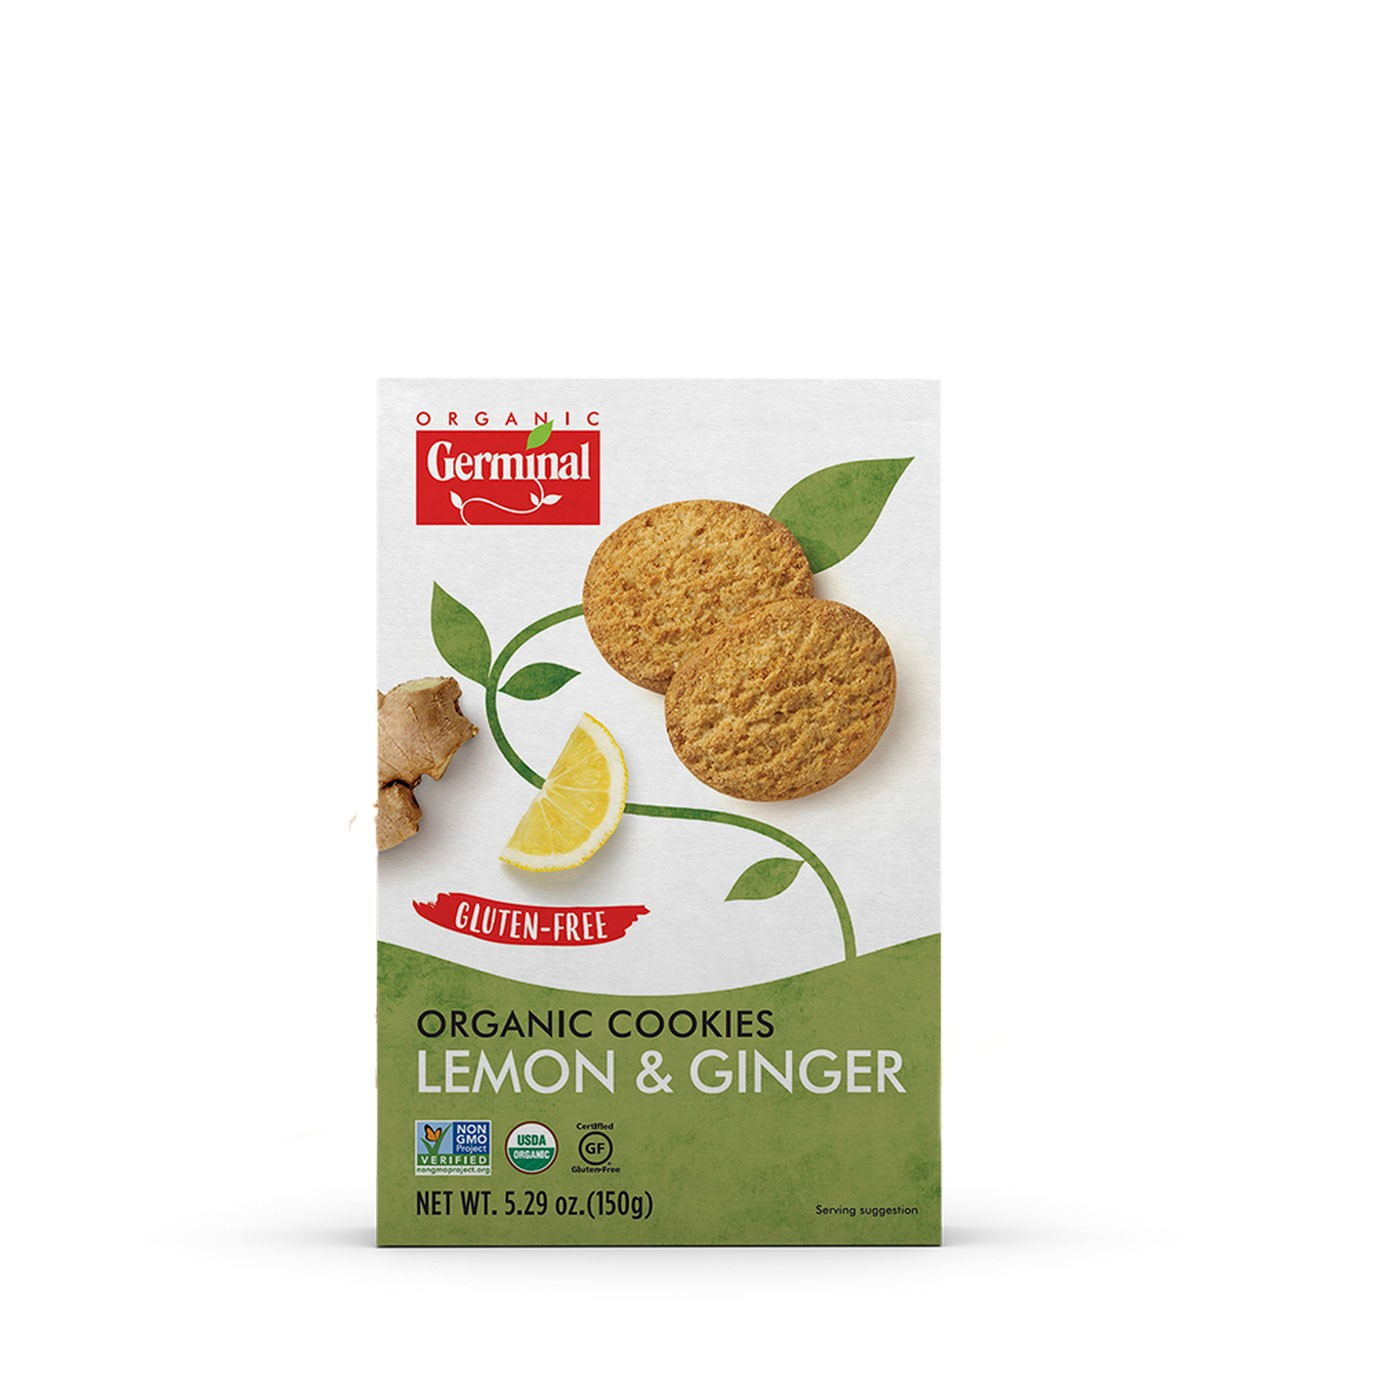 Lemon and Ginger Cookies 5 oz